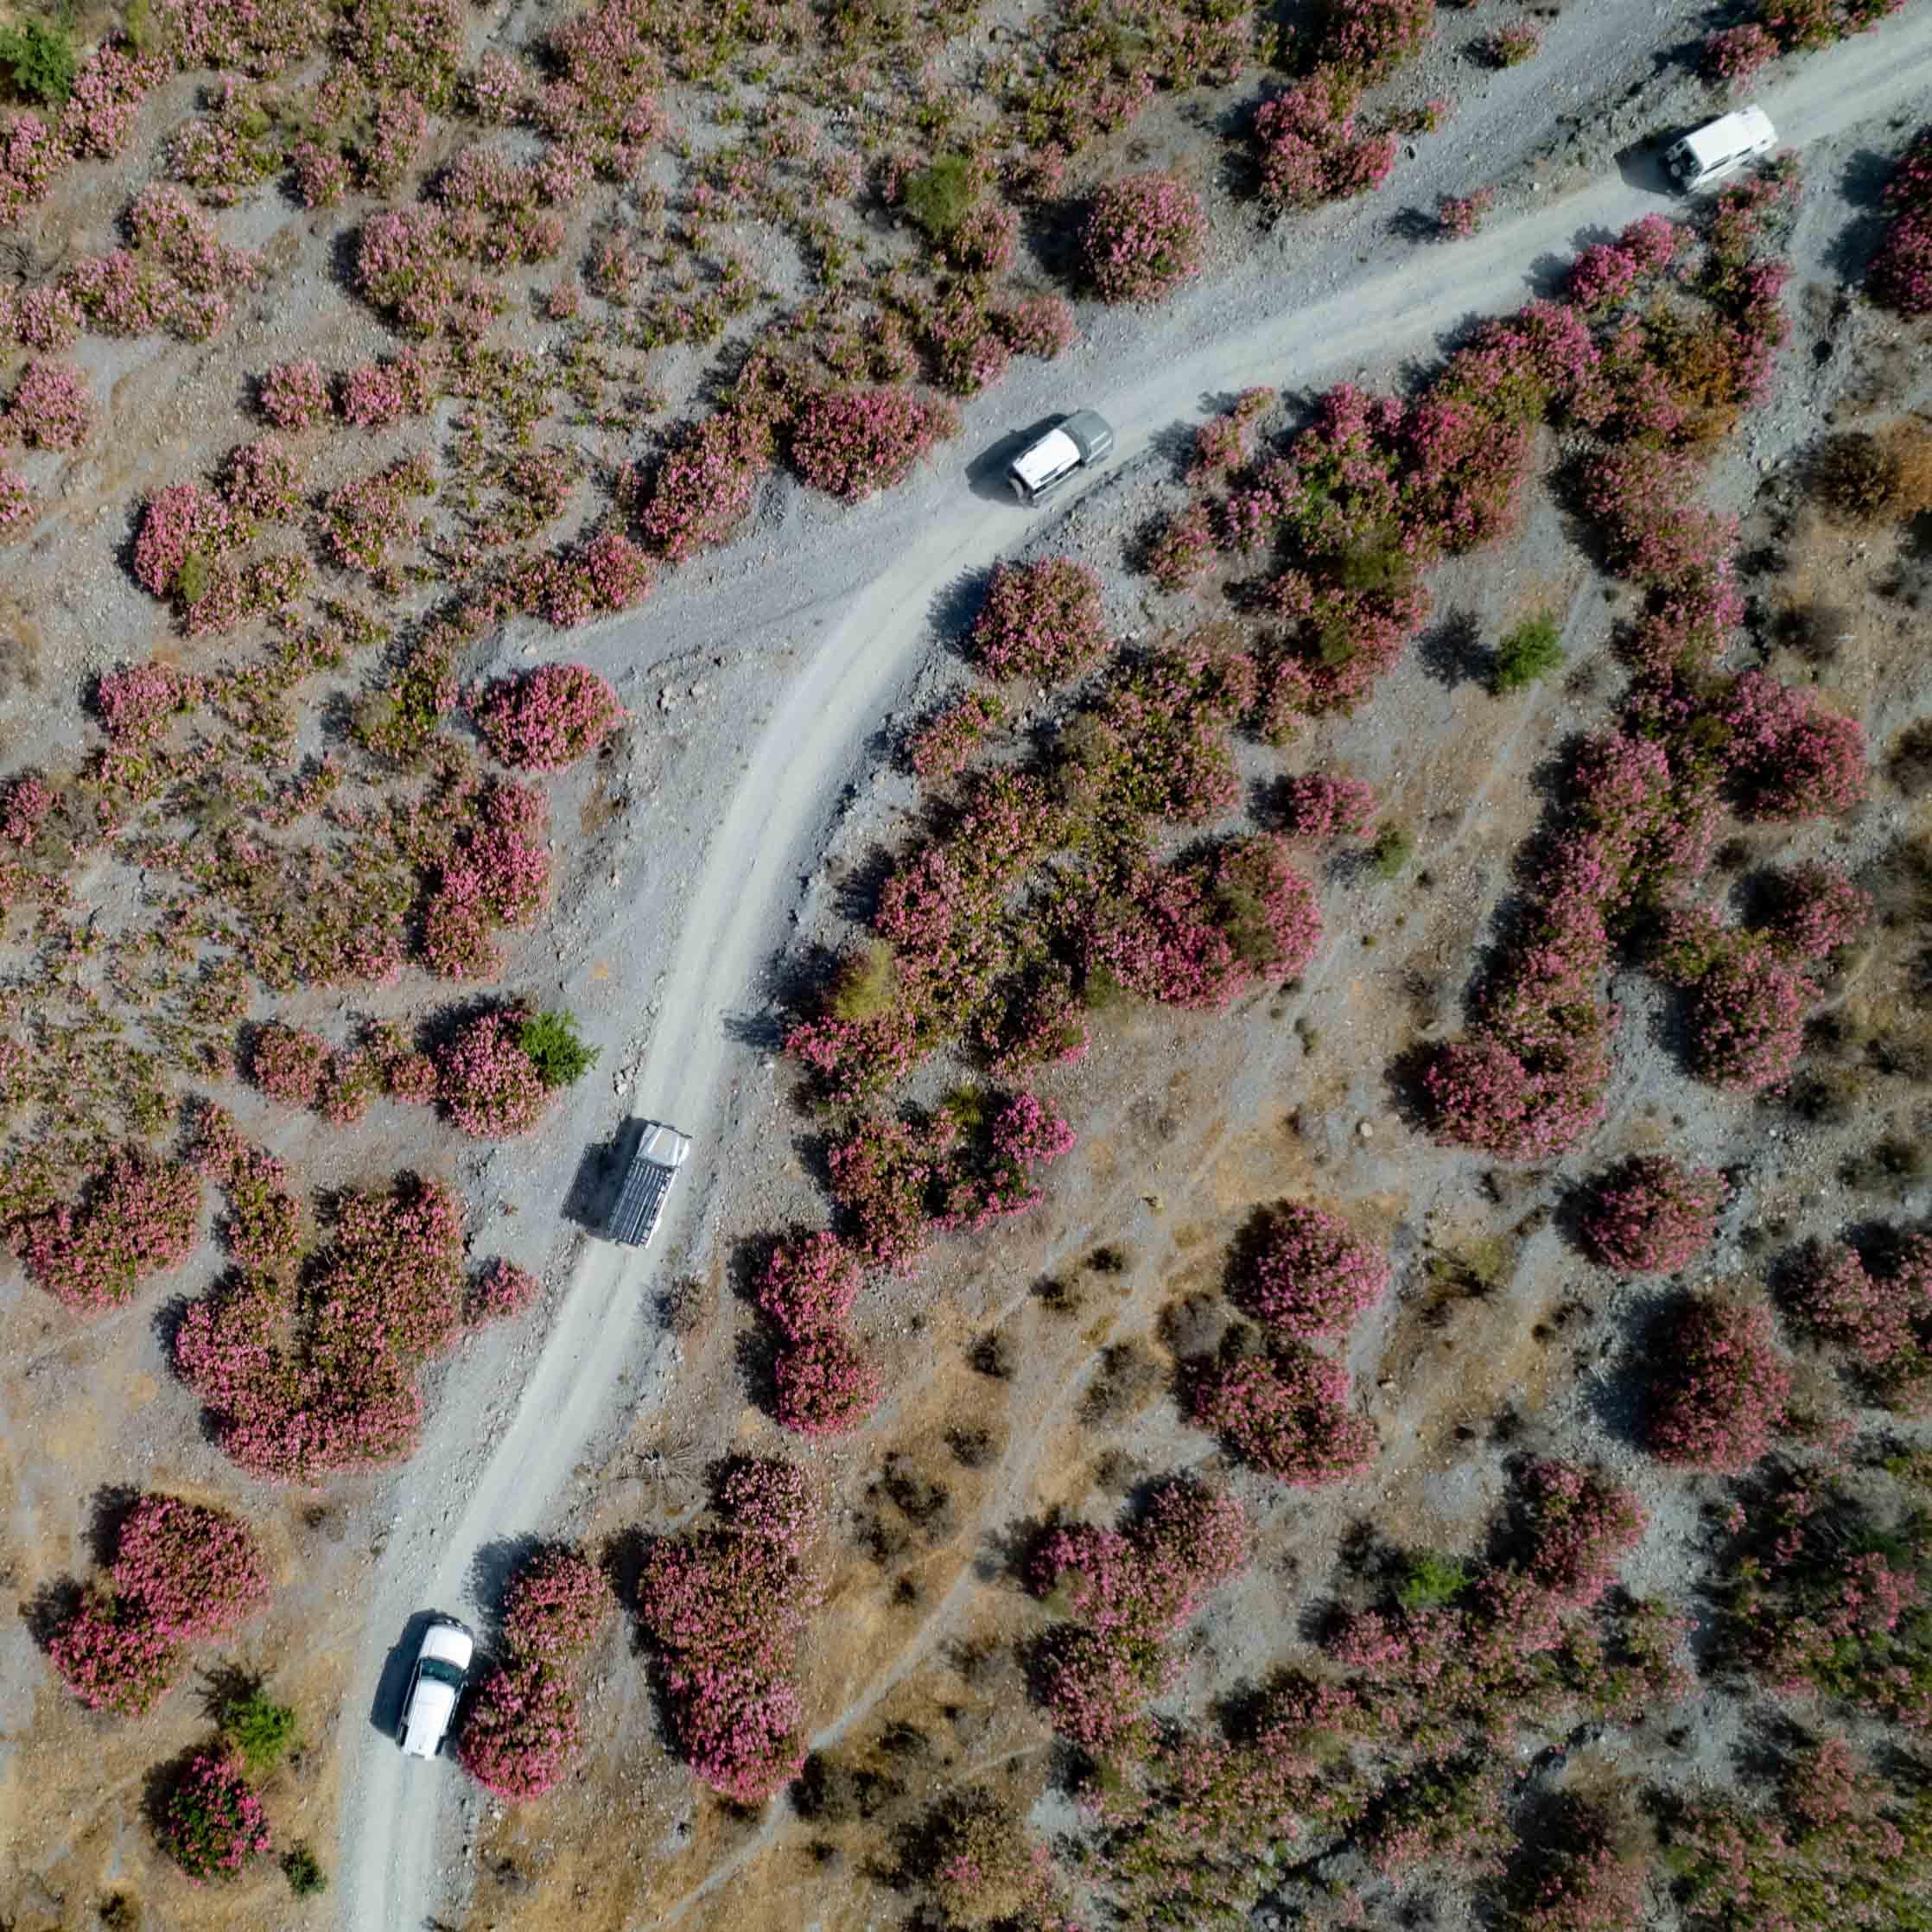 Land_Rover_Tour_Sicilia_2021_Land_Rover_Experience_Italia_-6